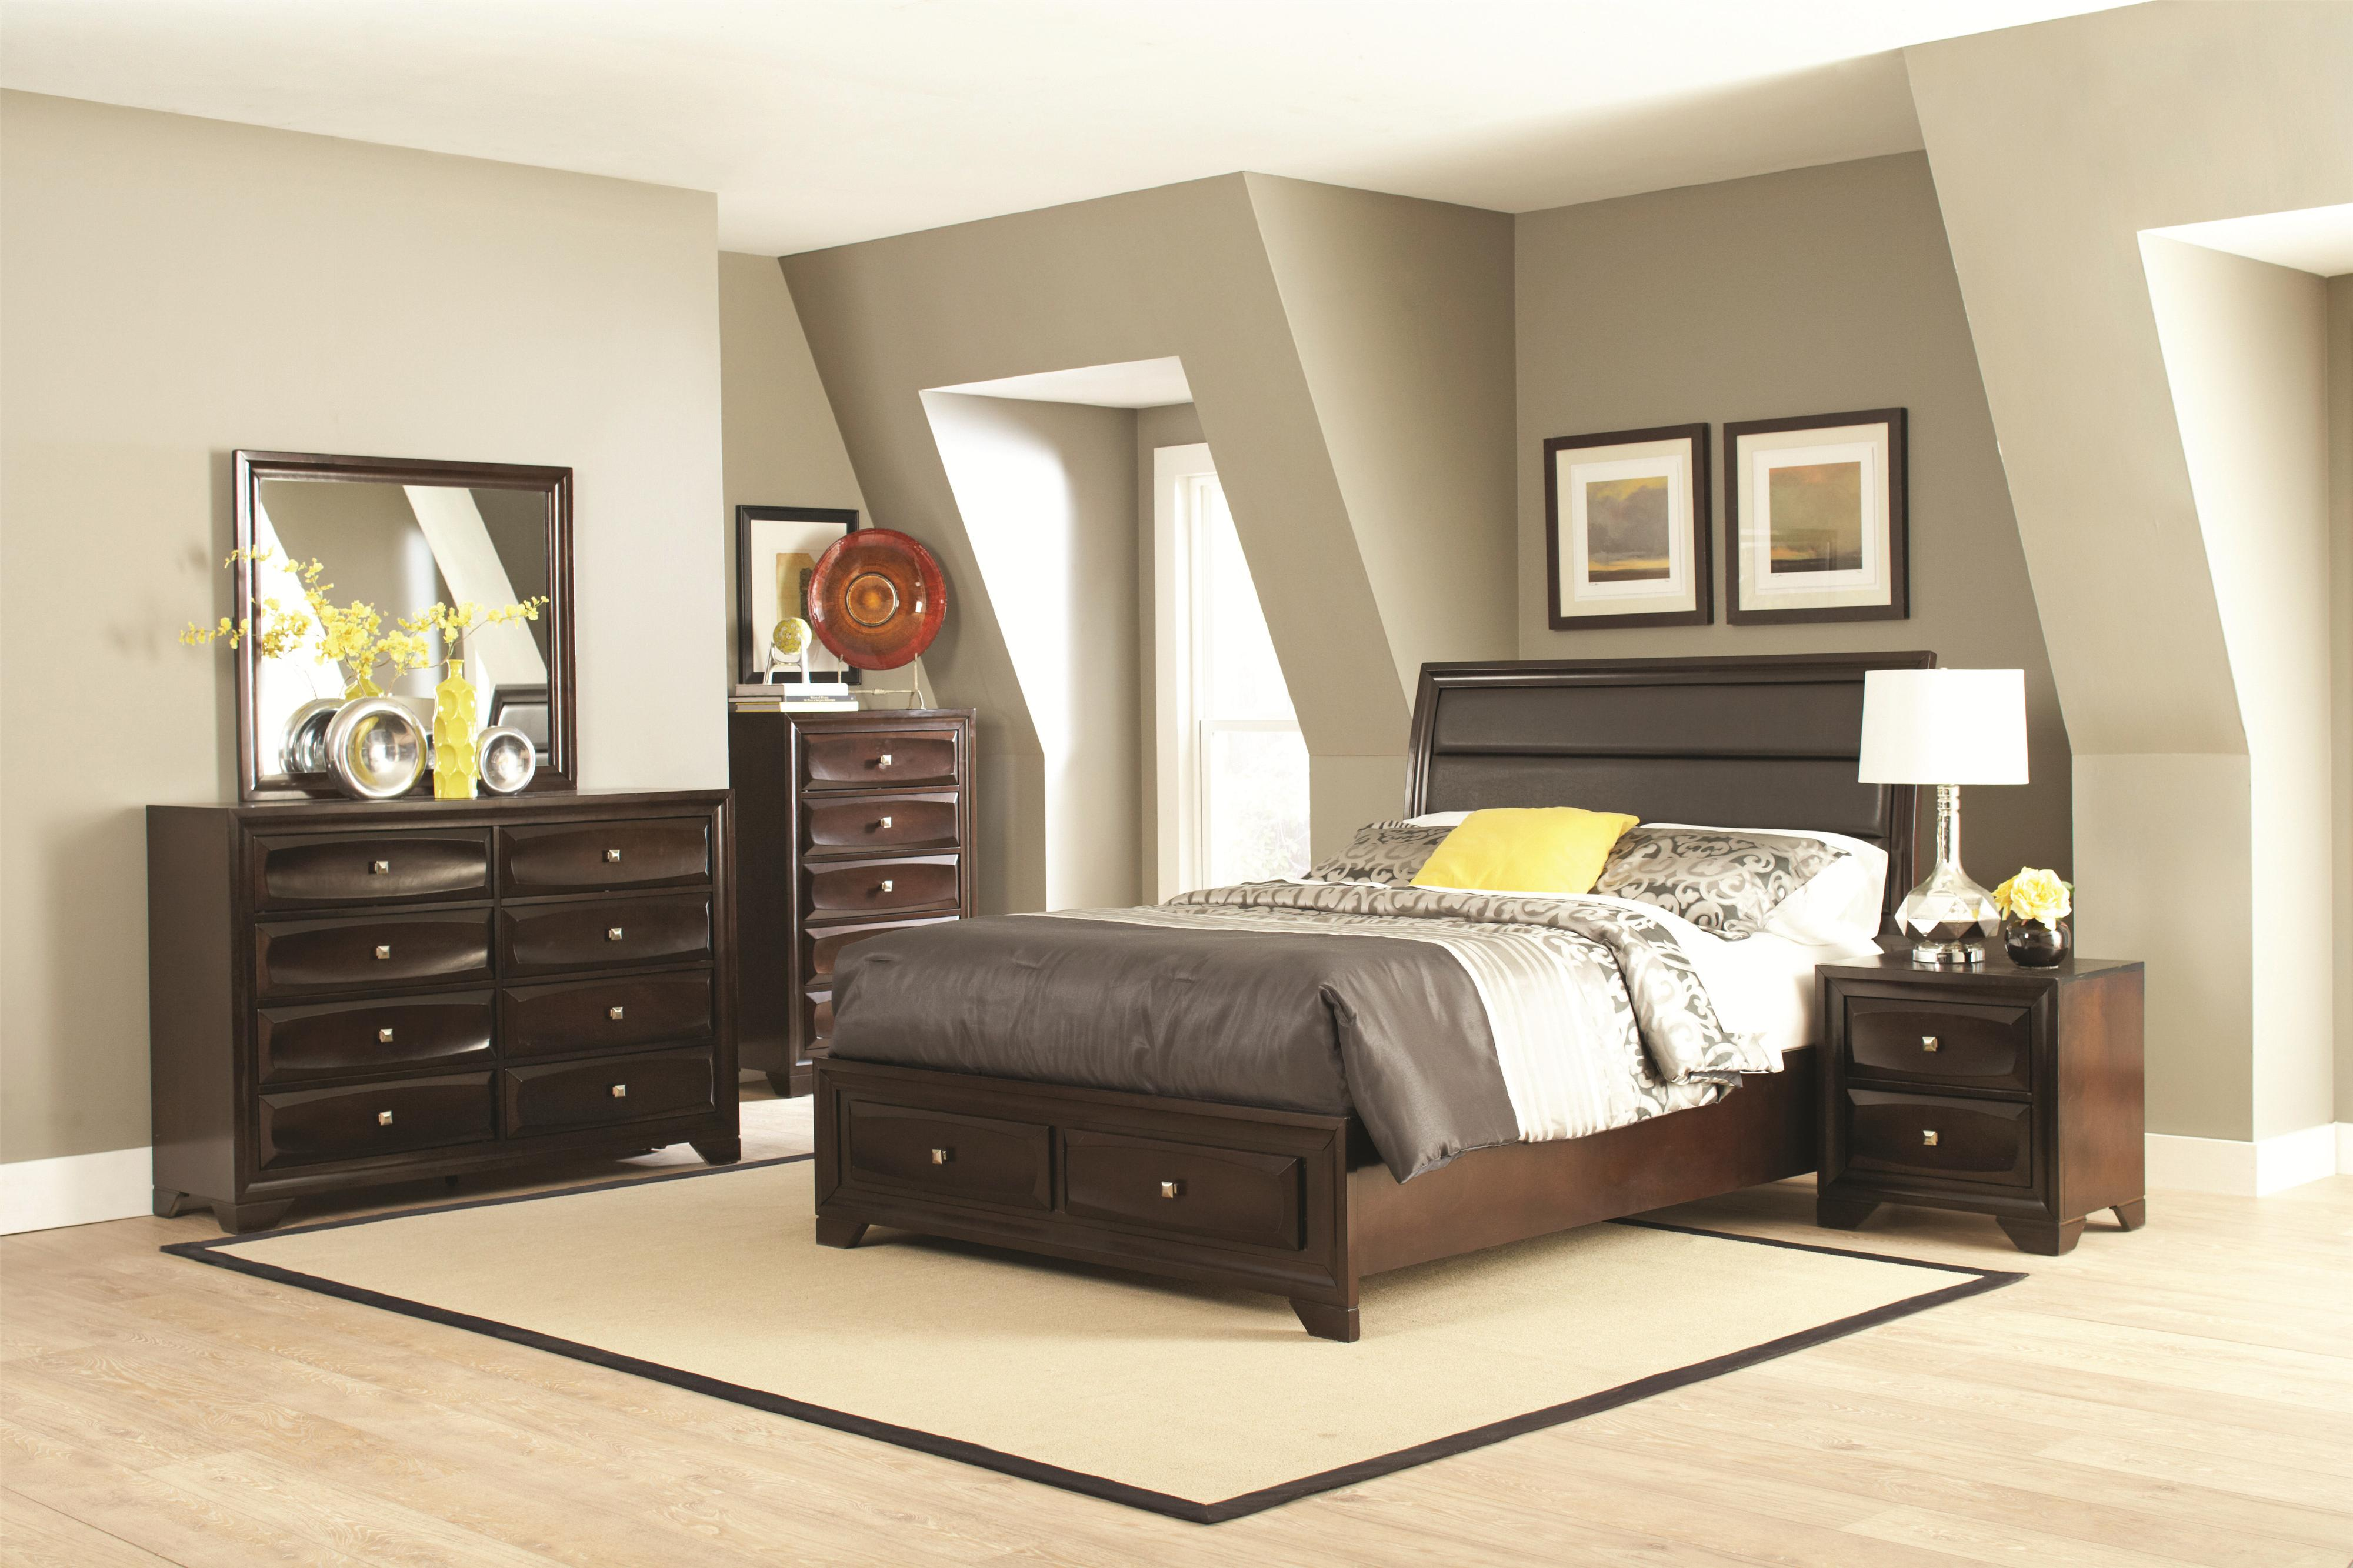 Coaster Jaxson Bedroom Group - Item Number: K Bedroom Group